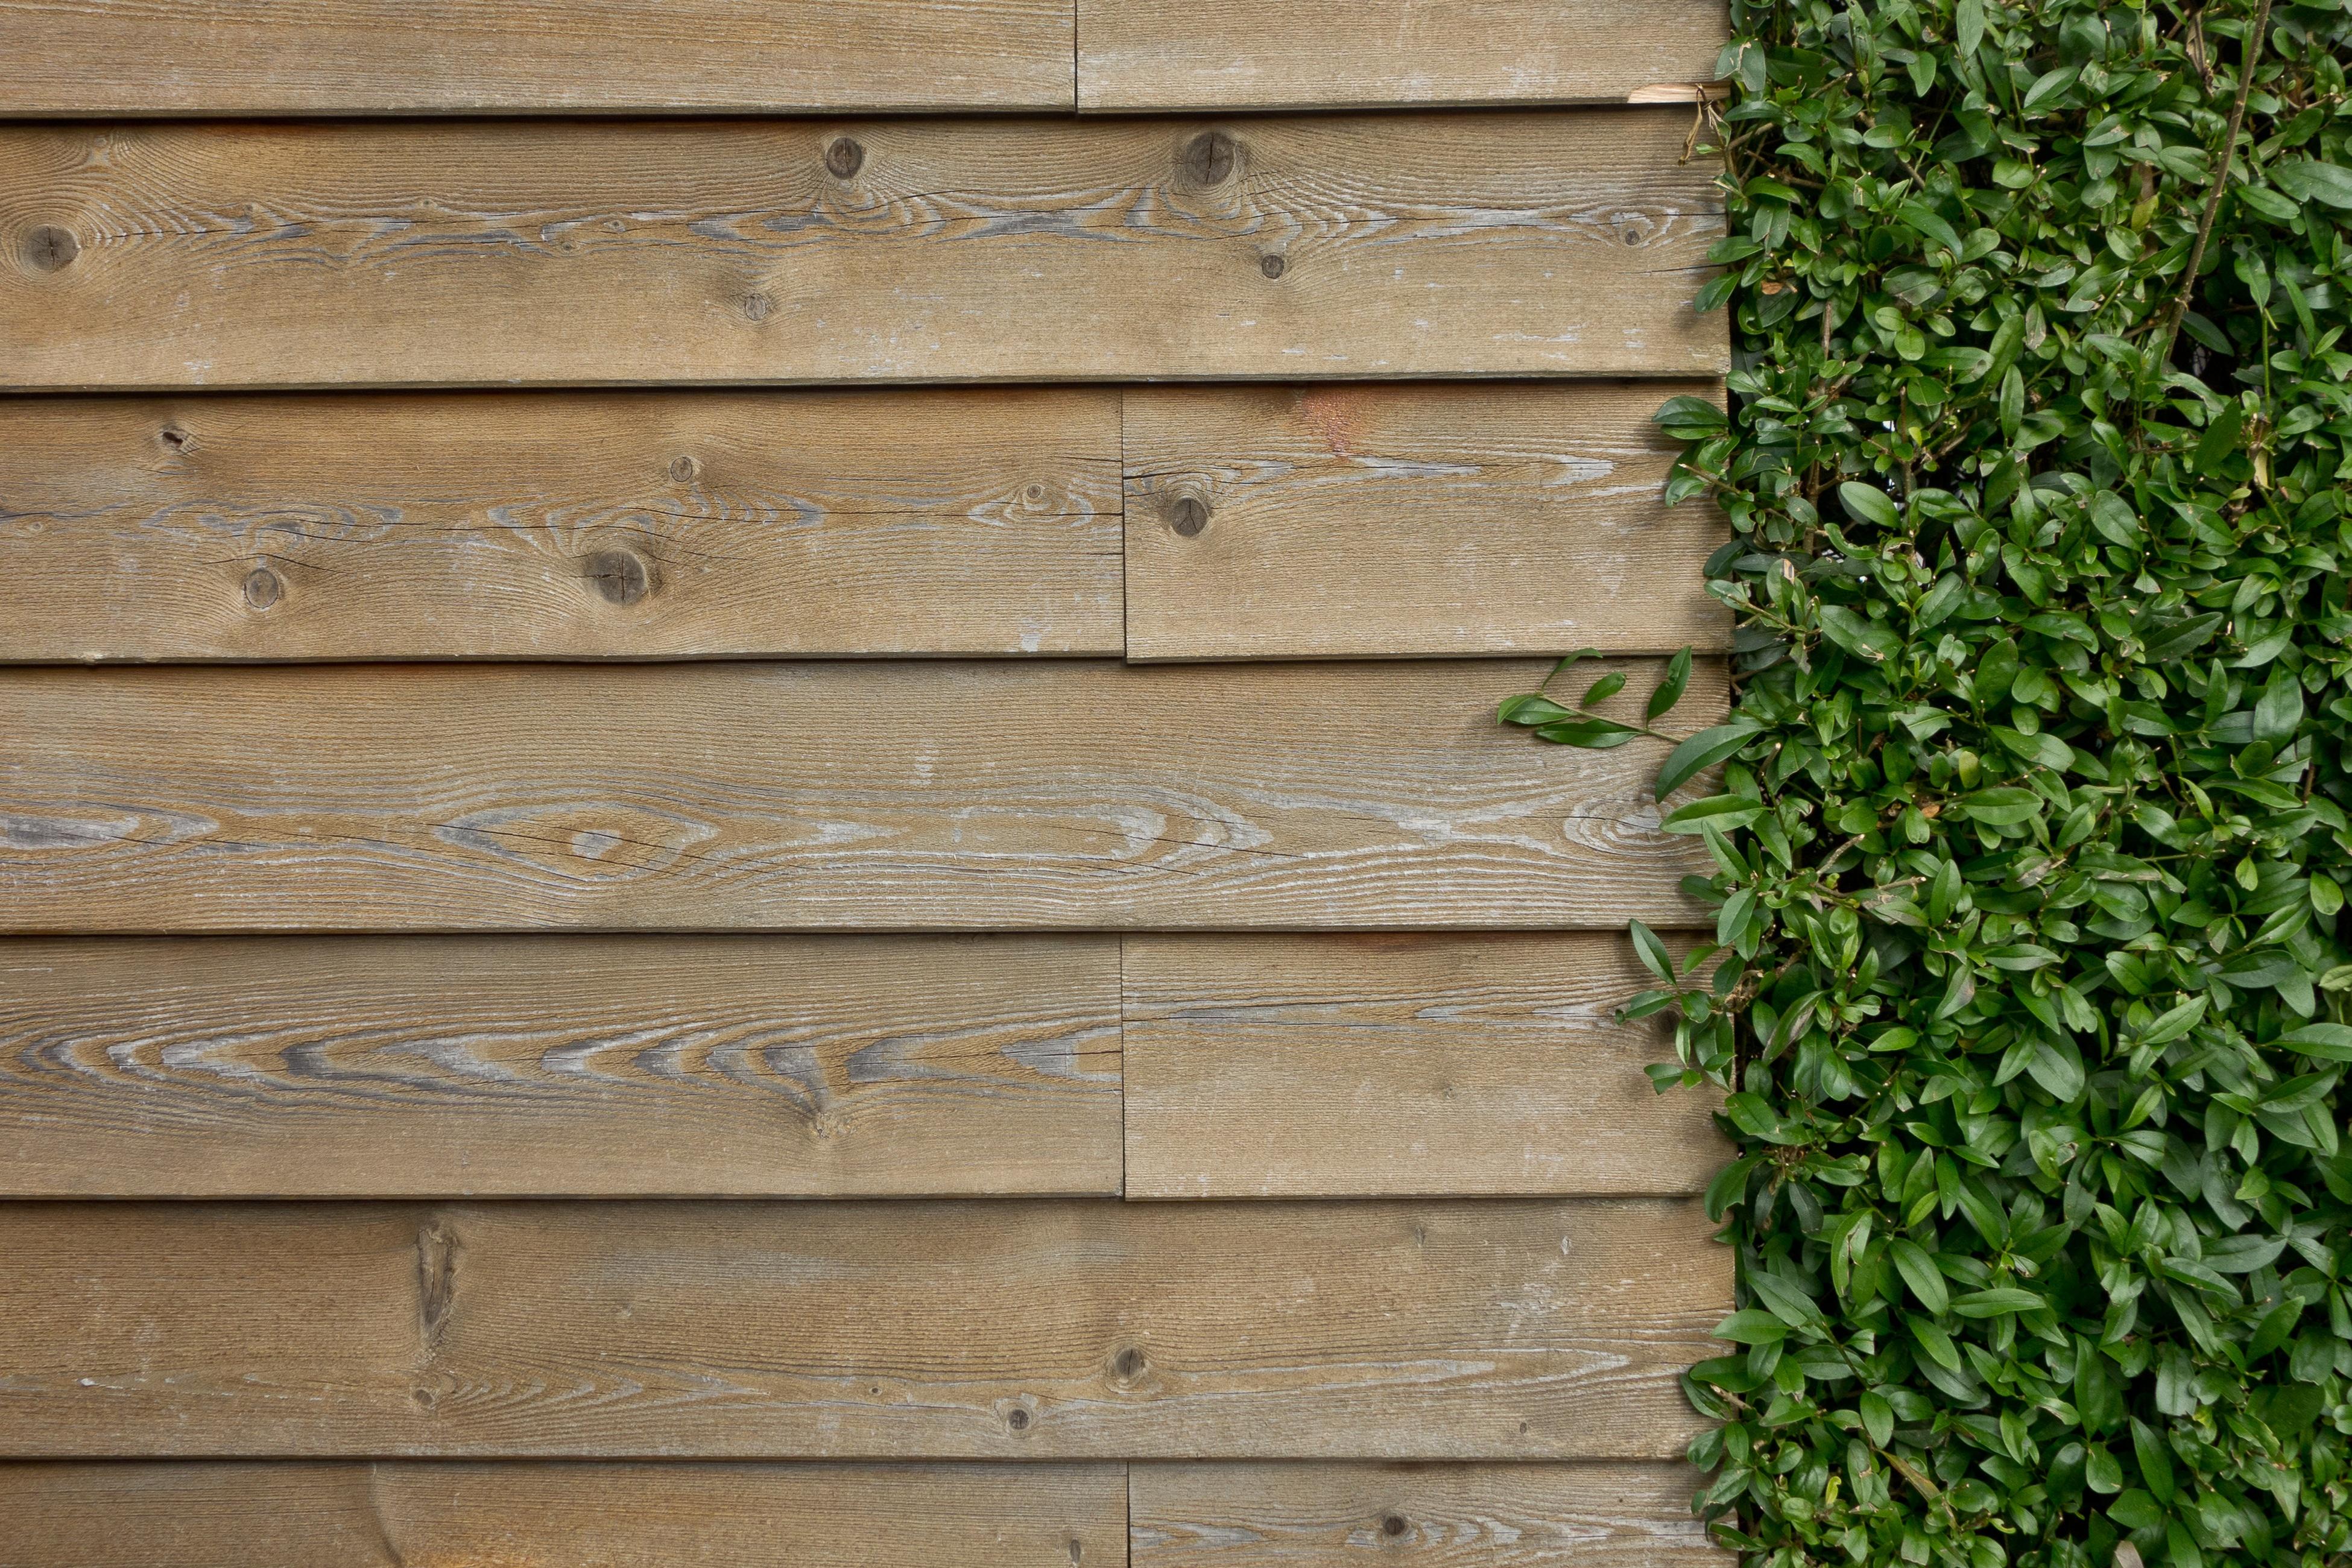 Free Images Structure Grain Texture Floor Ivy